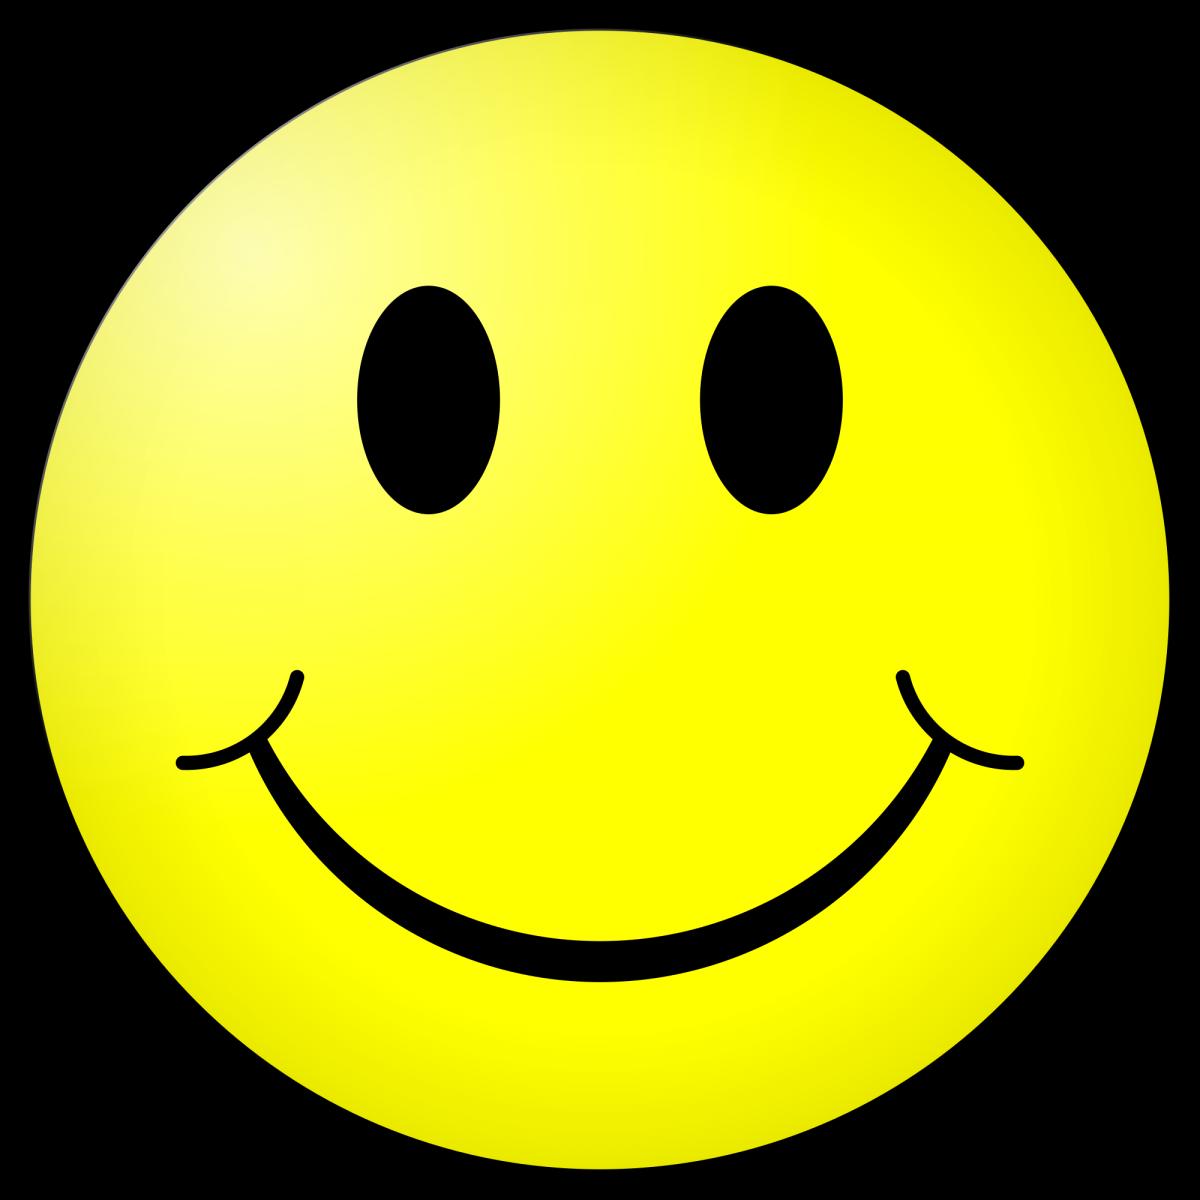 Når kan du være happy?